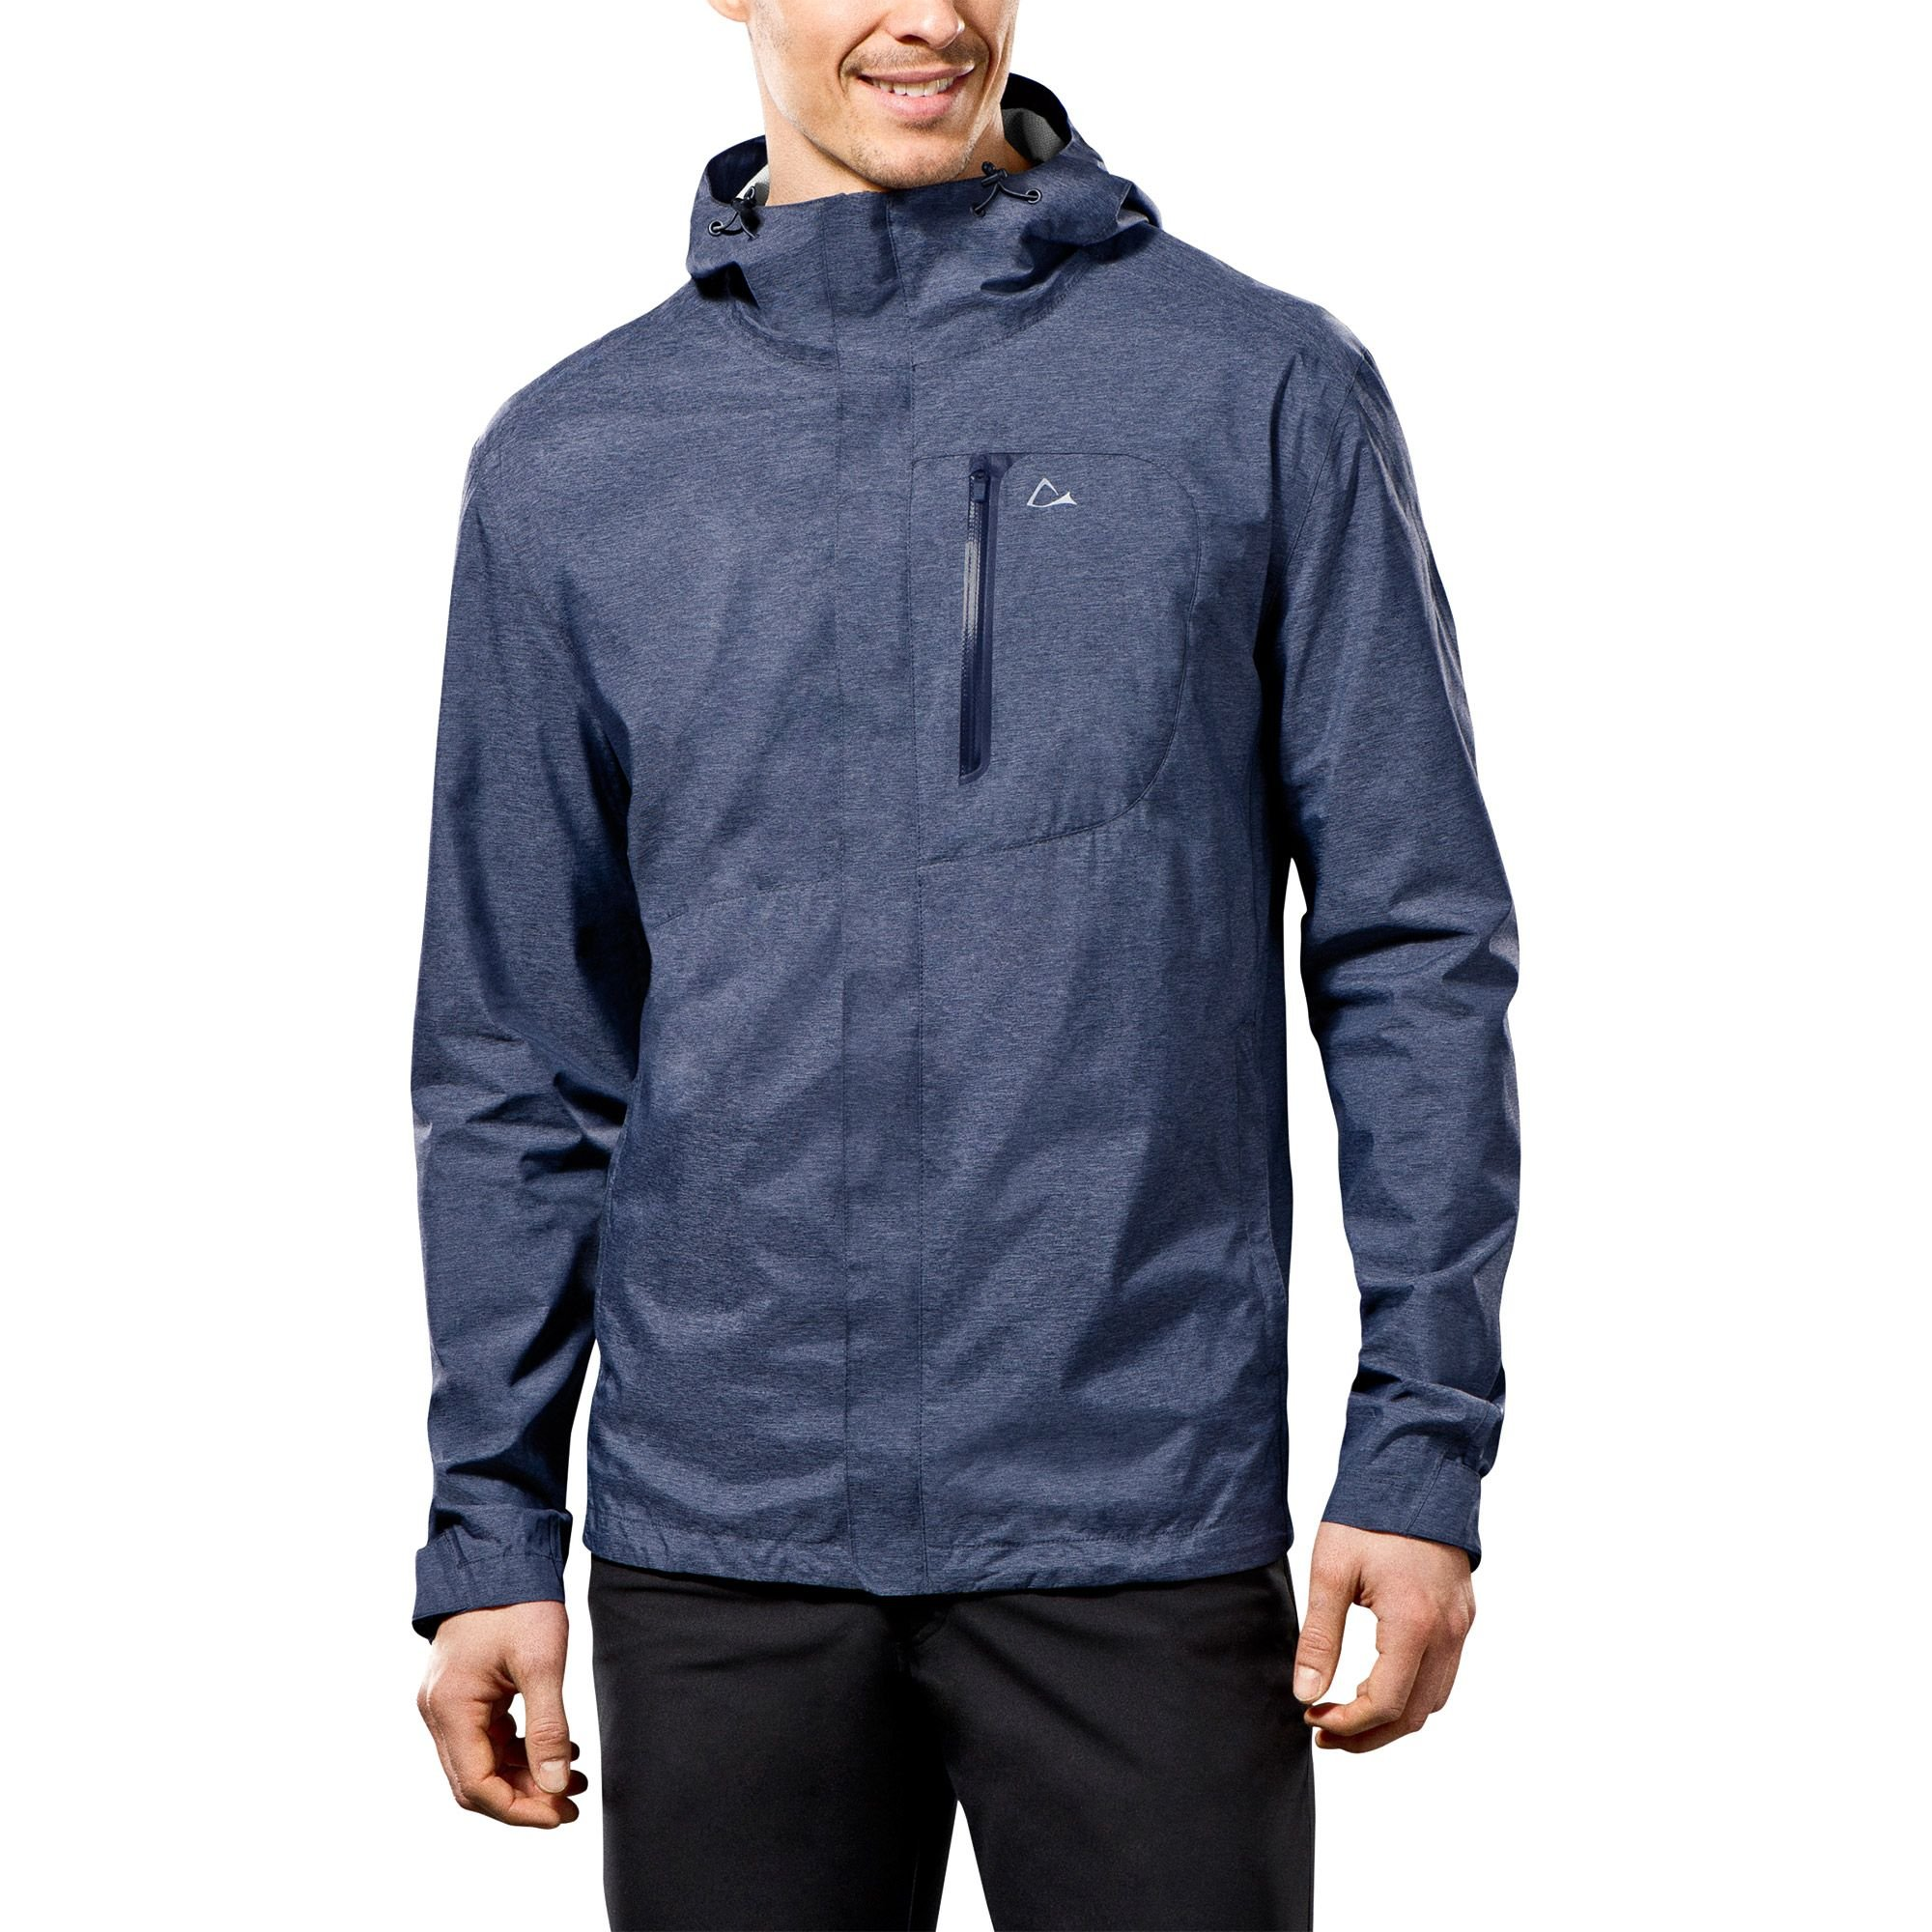 Paradox Men's Waterproof & Breathable Rain Jacket, X-Large, Heather Blue